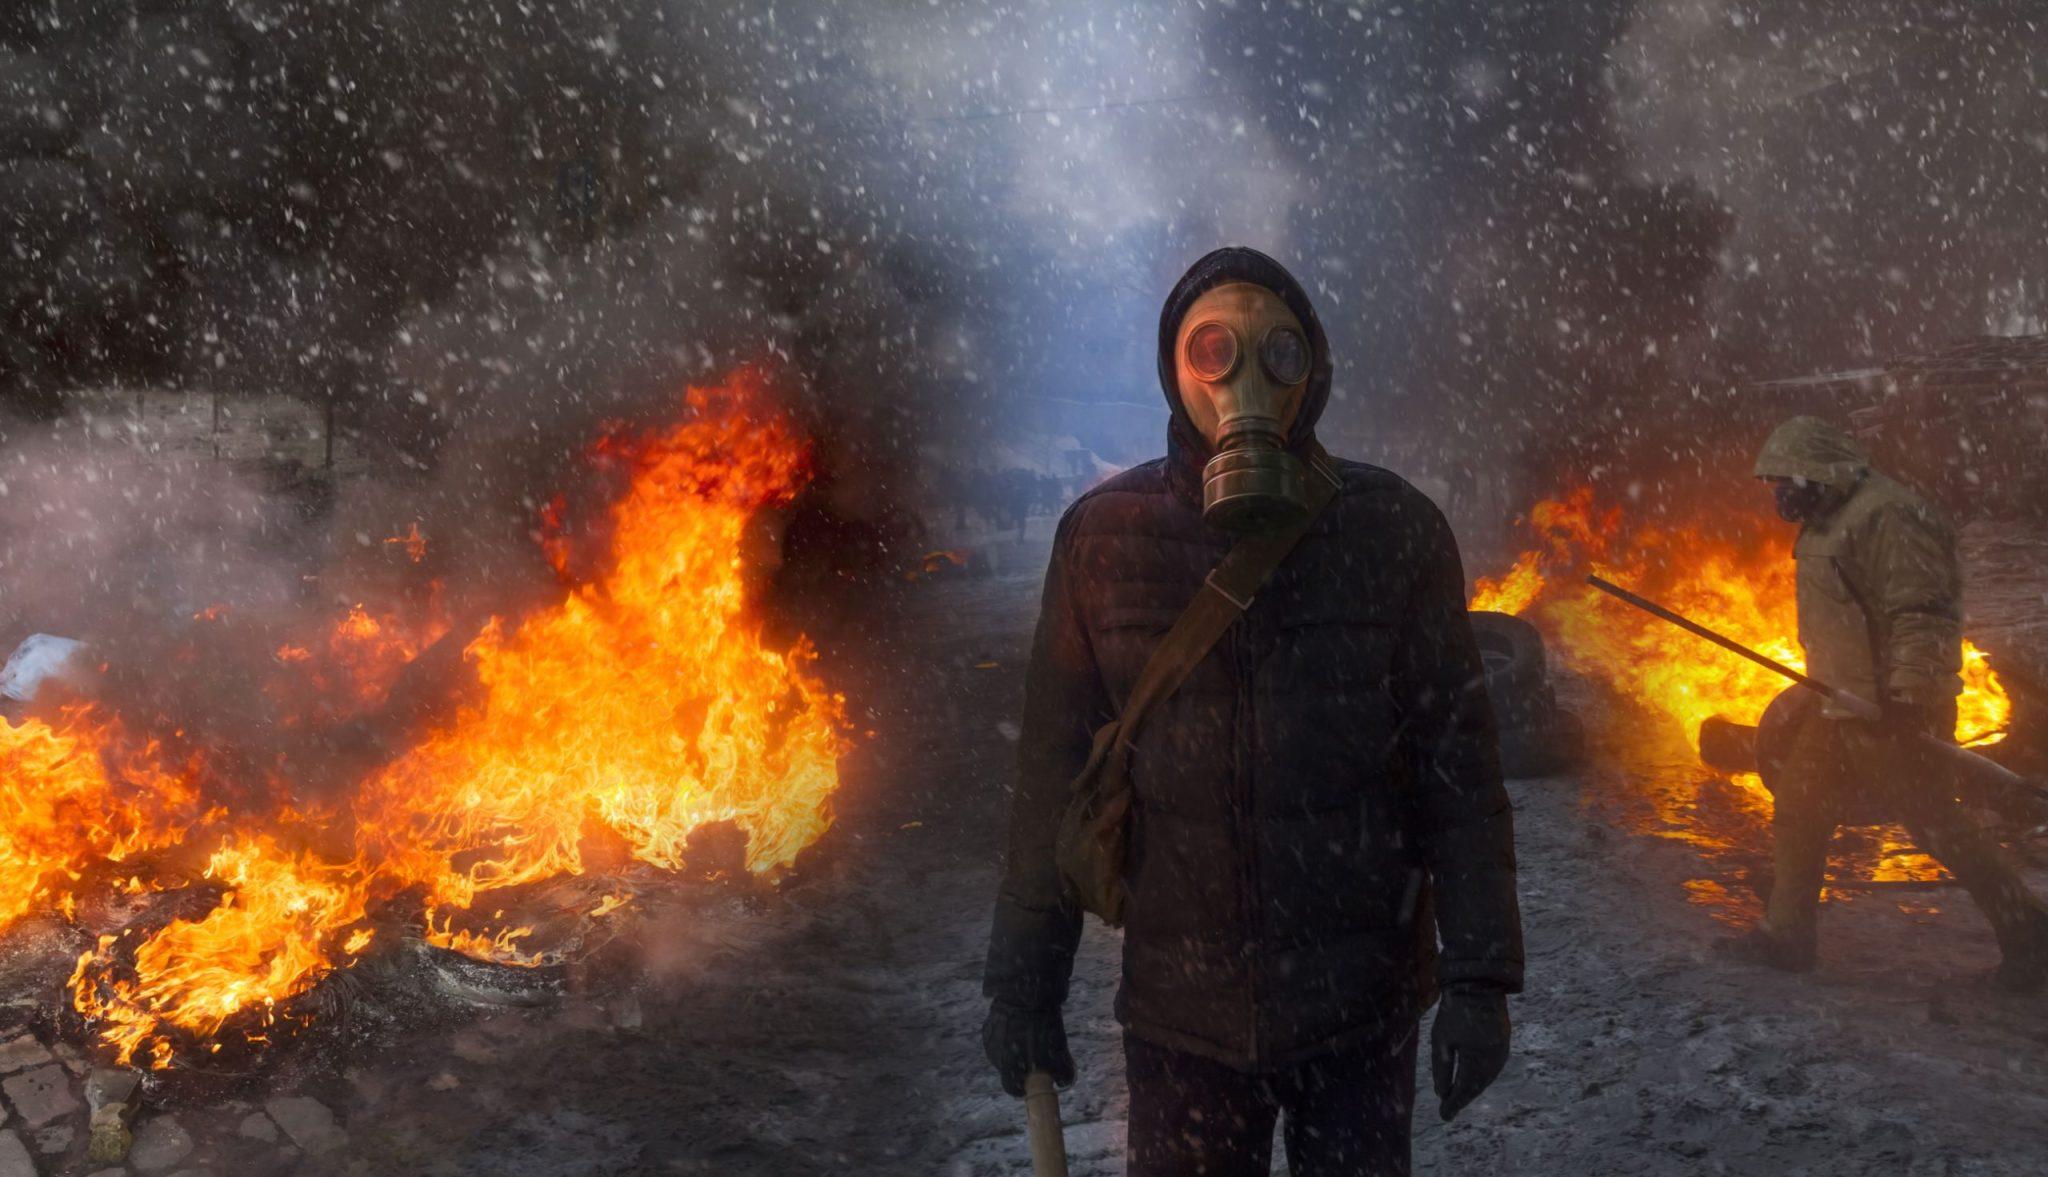 gasmask_burning_tires